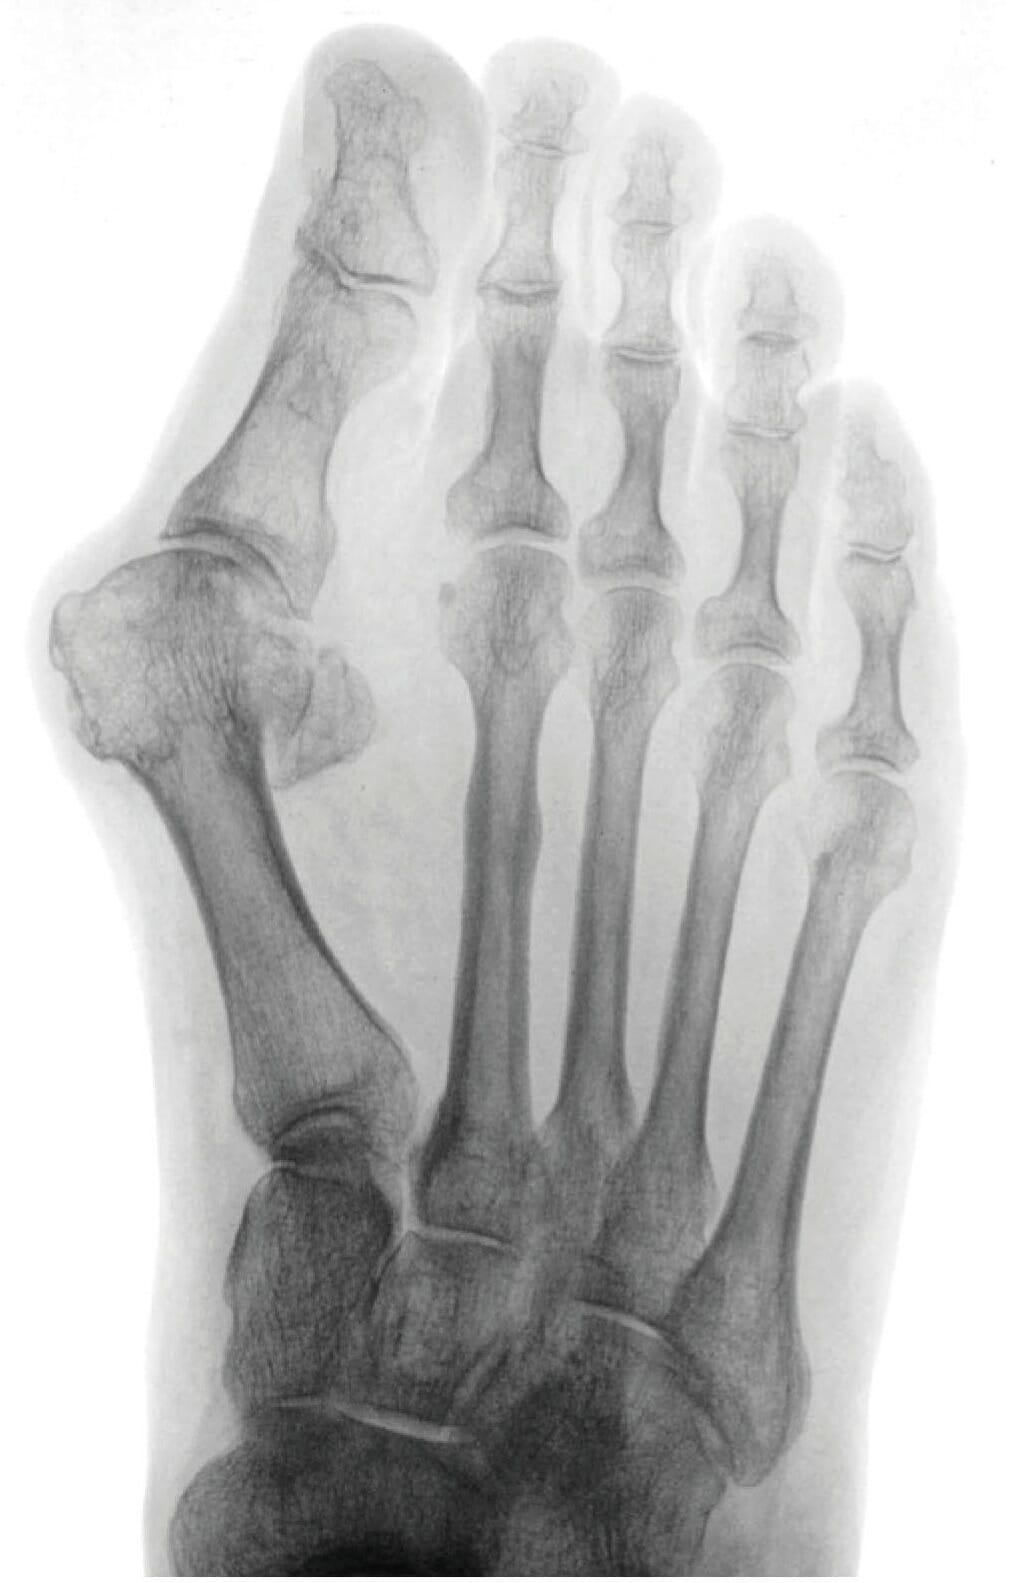 Präperatives Röntgenbild - Hallux valgus, Metatarsus primus varus, dezentrierte Sesambeine